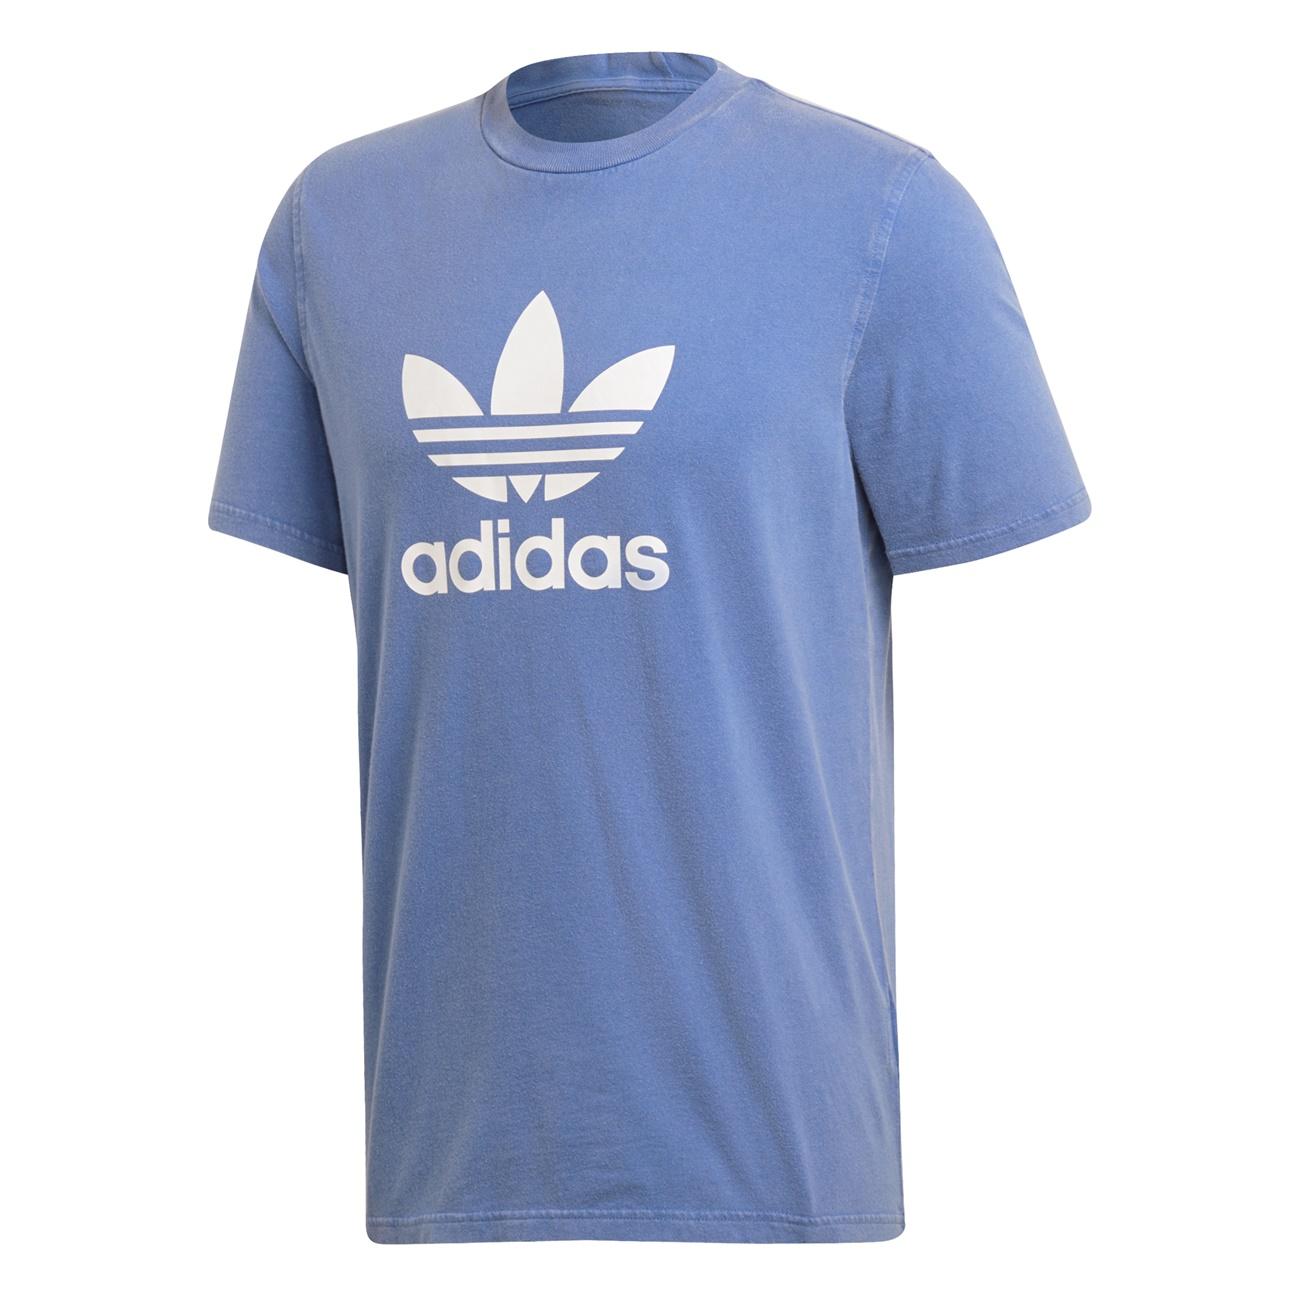 T Adidas Trefoil Shirt blue Originals ETRwqT